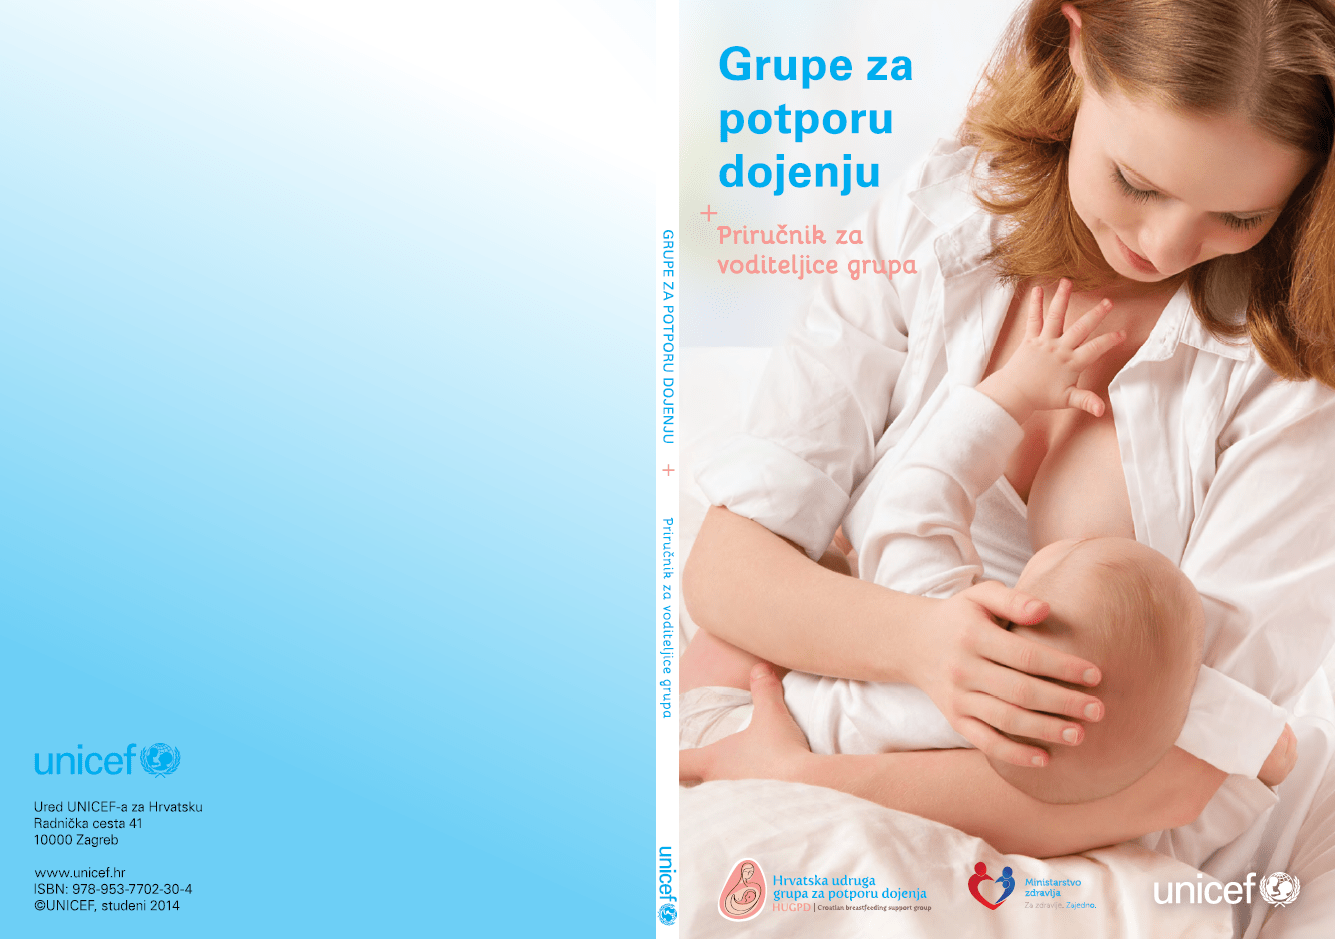 Grupe za potporu dojenju i priručnik za voditeljice grupa (2014.)